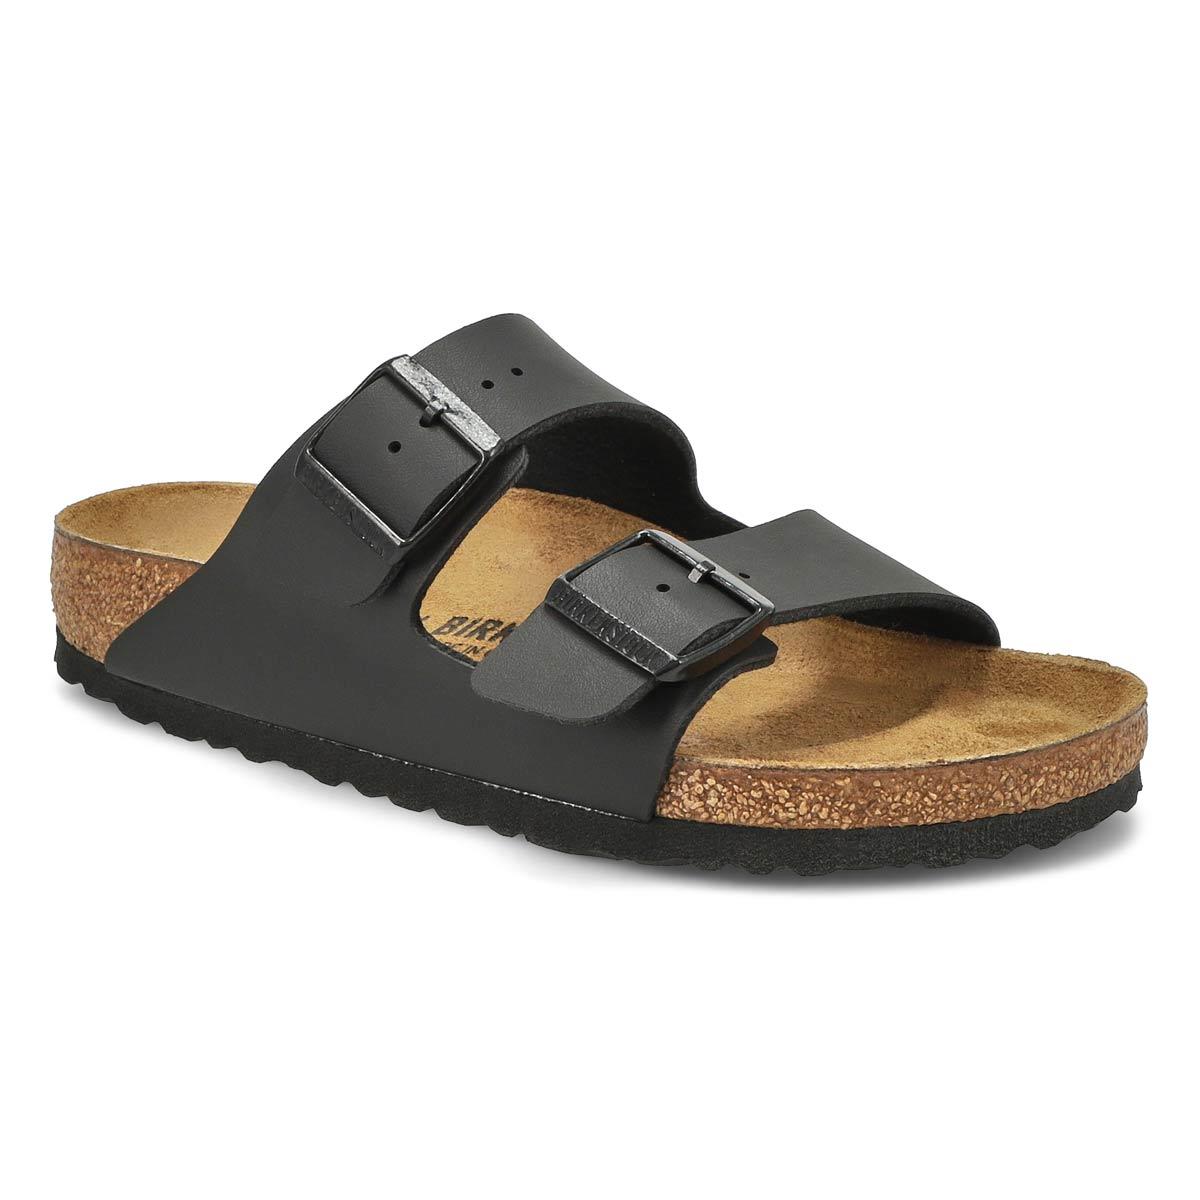 Women's Arizona BF Sandal - Black